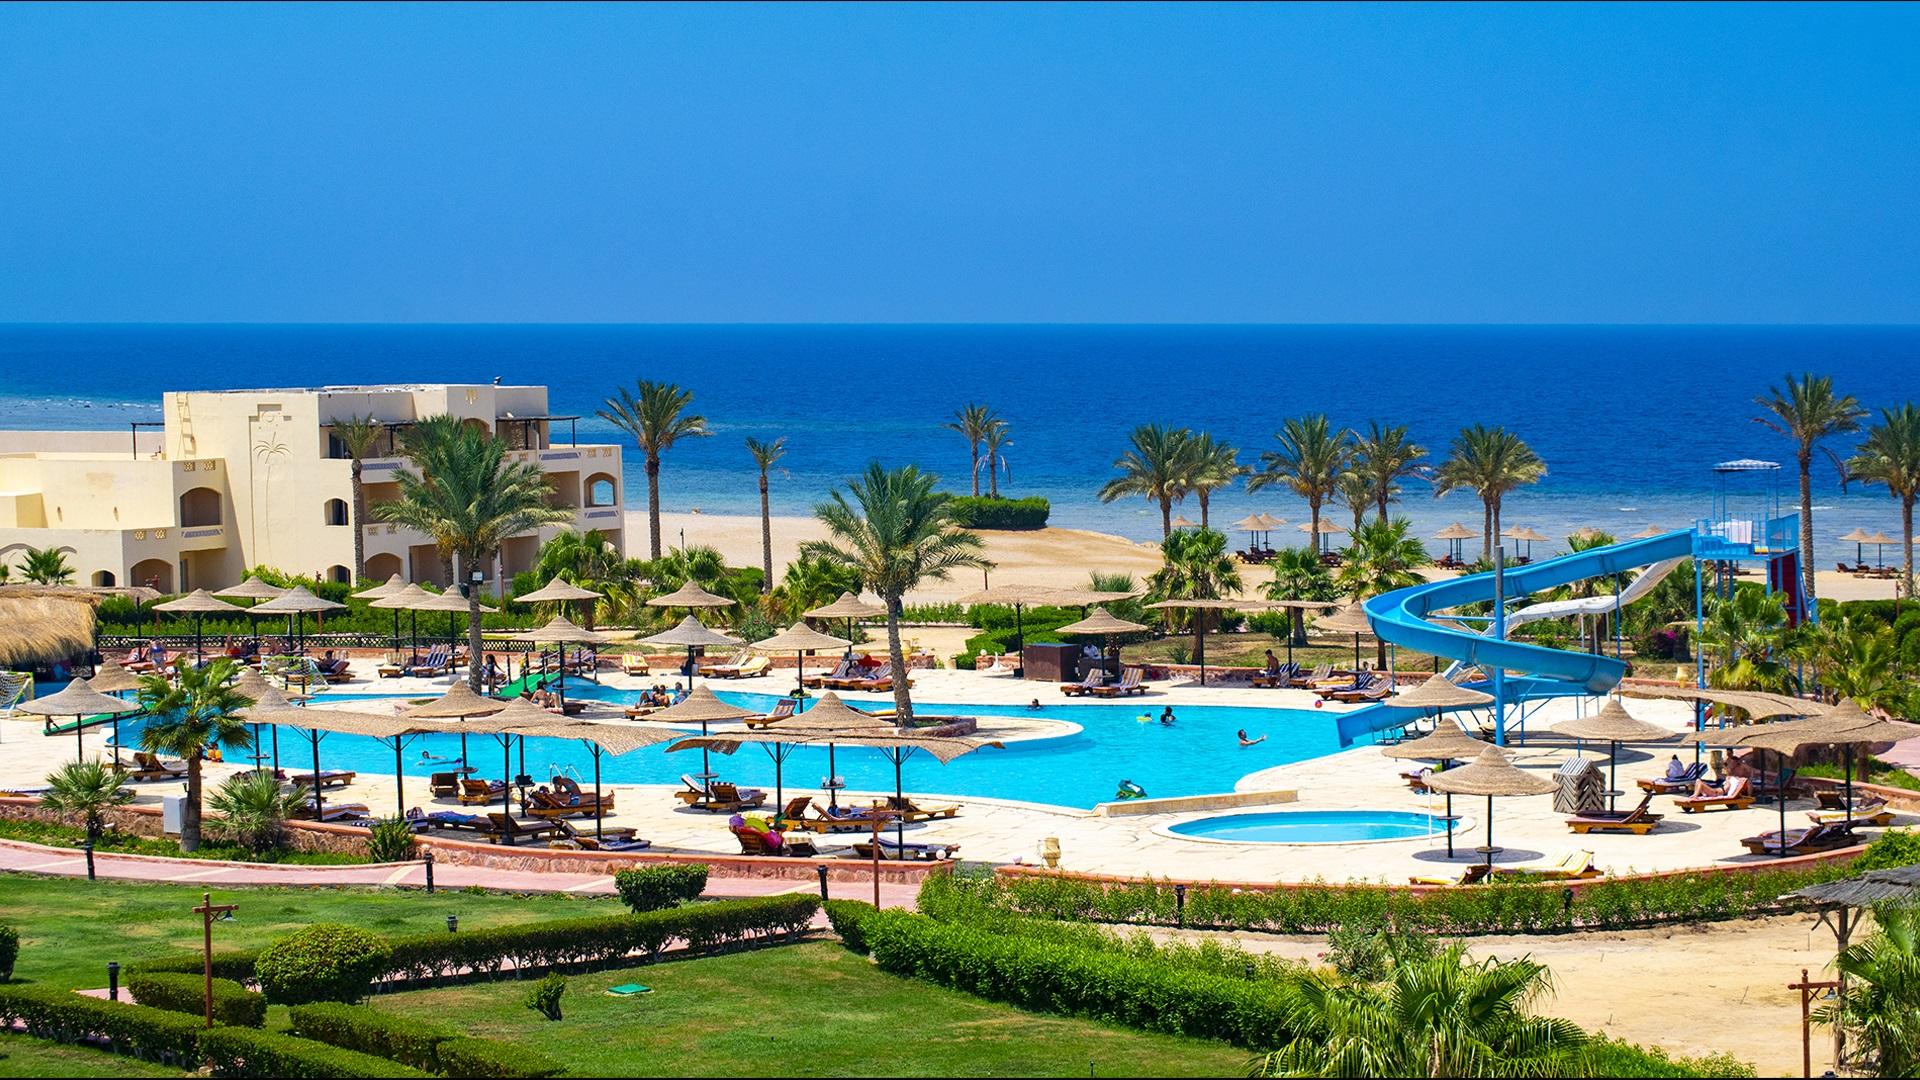 Jolie Beach Resort Egipt, Marsa Alam